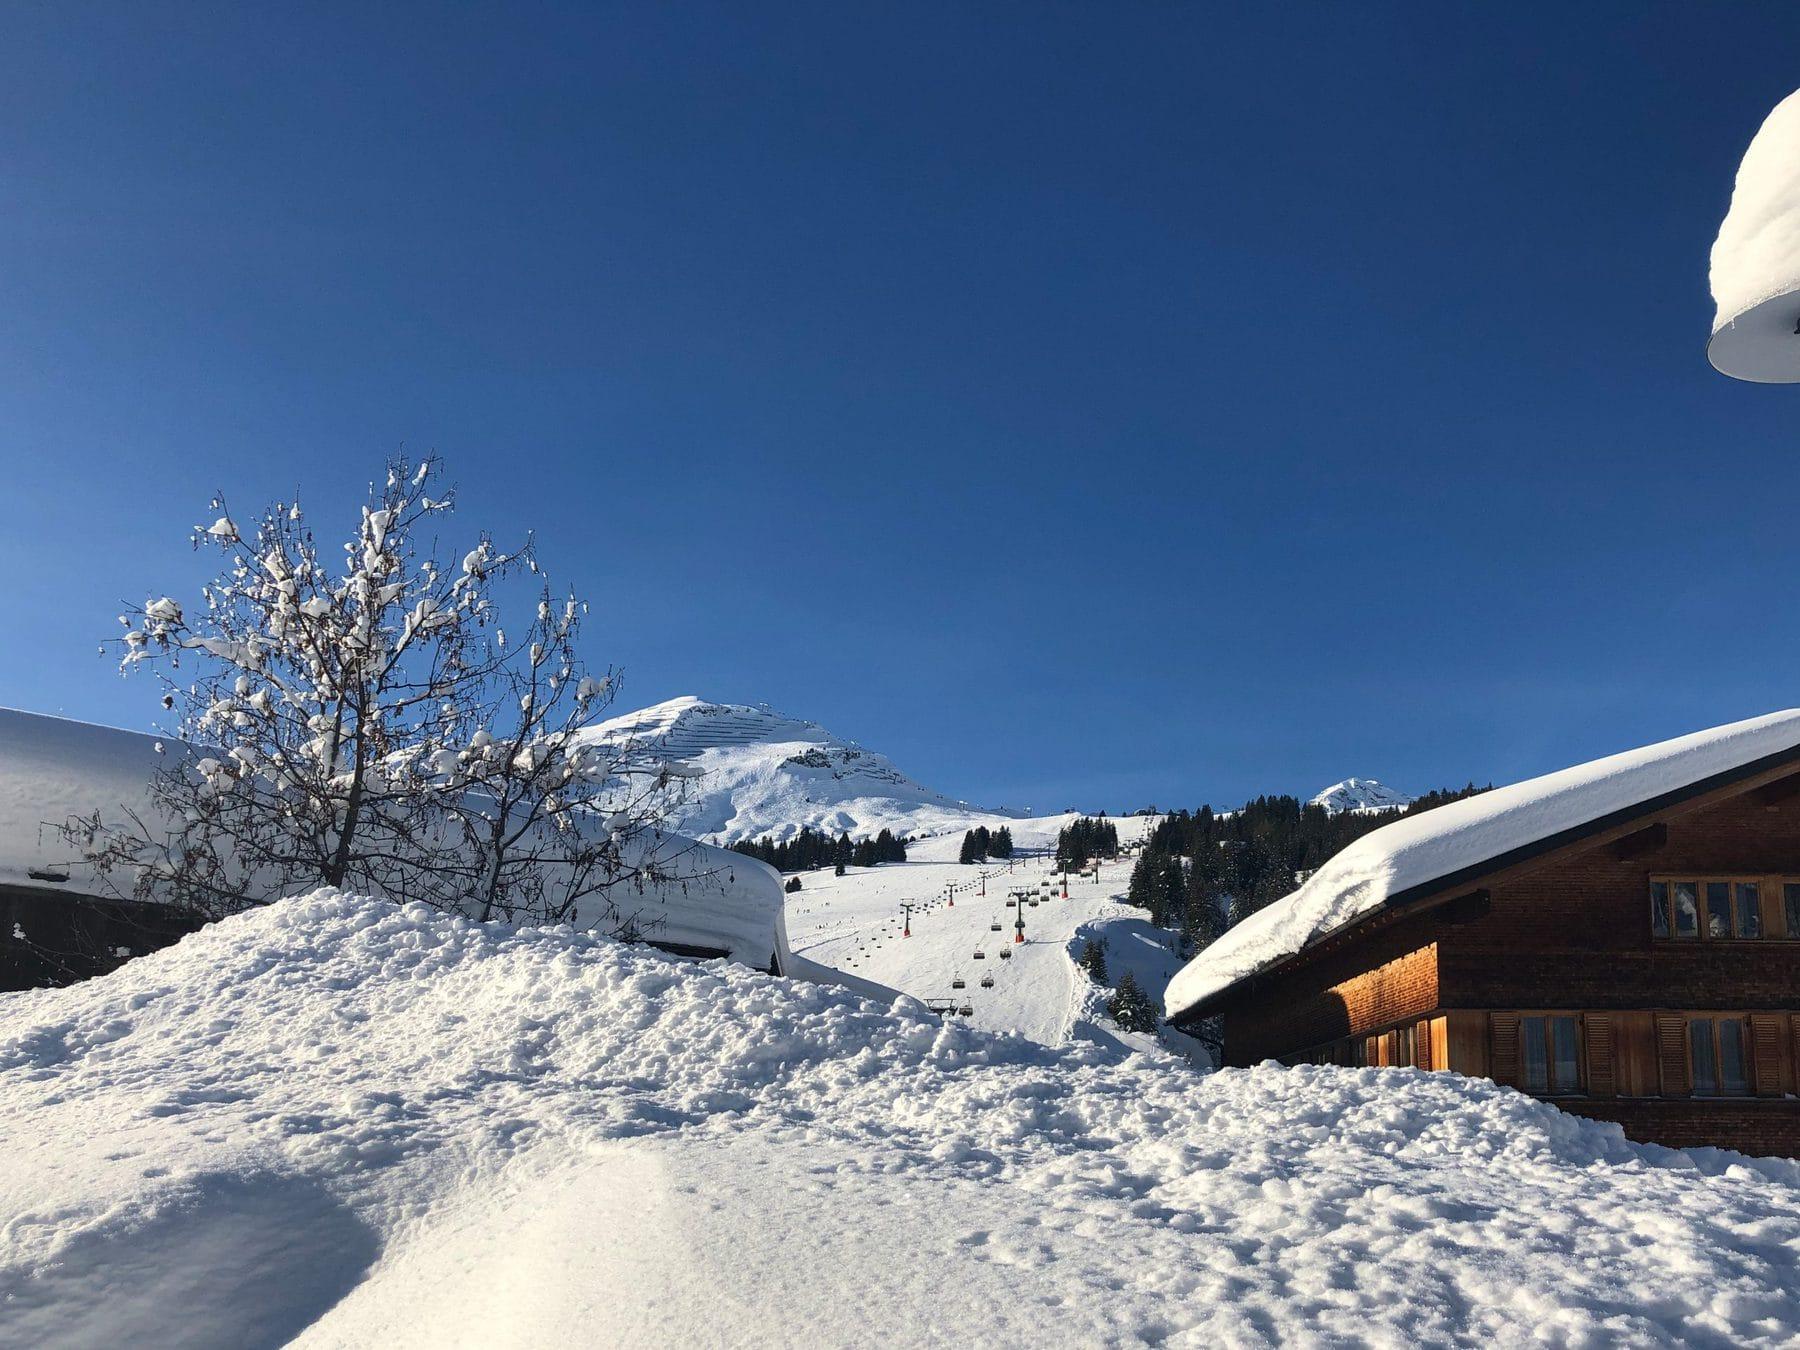 Wunderschöne Lech Webcam Ausblicke im Winter